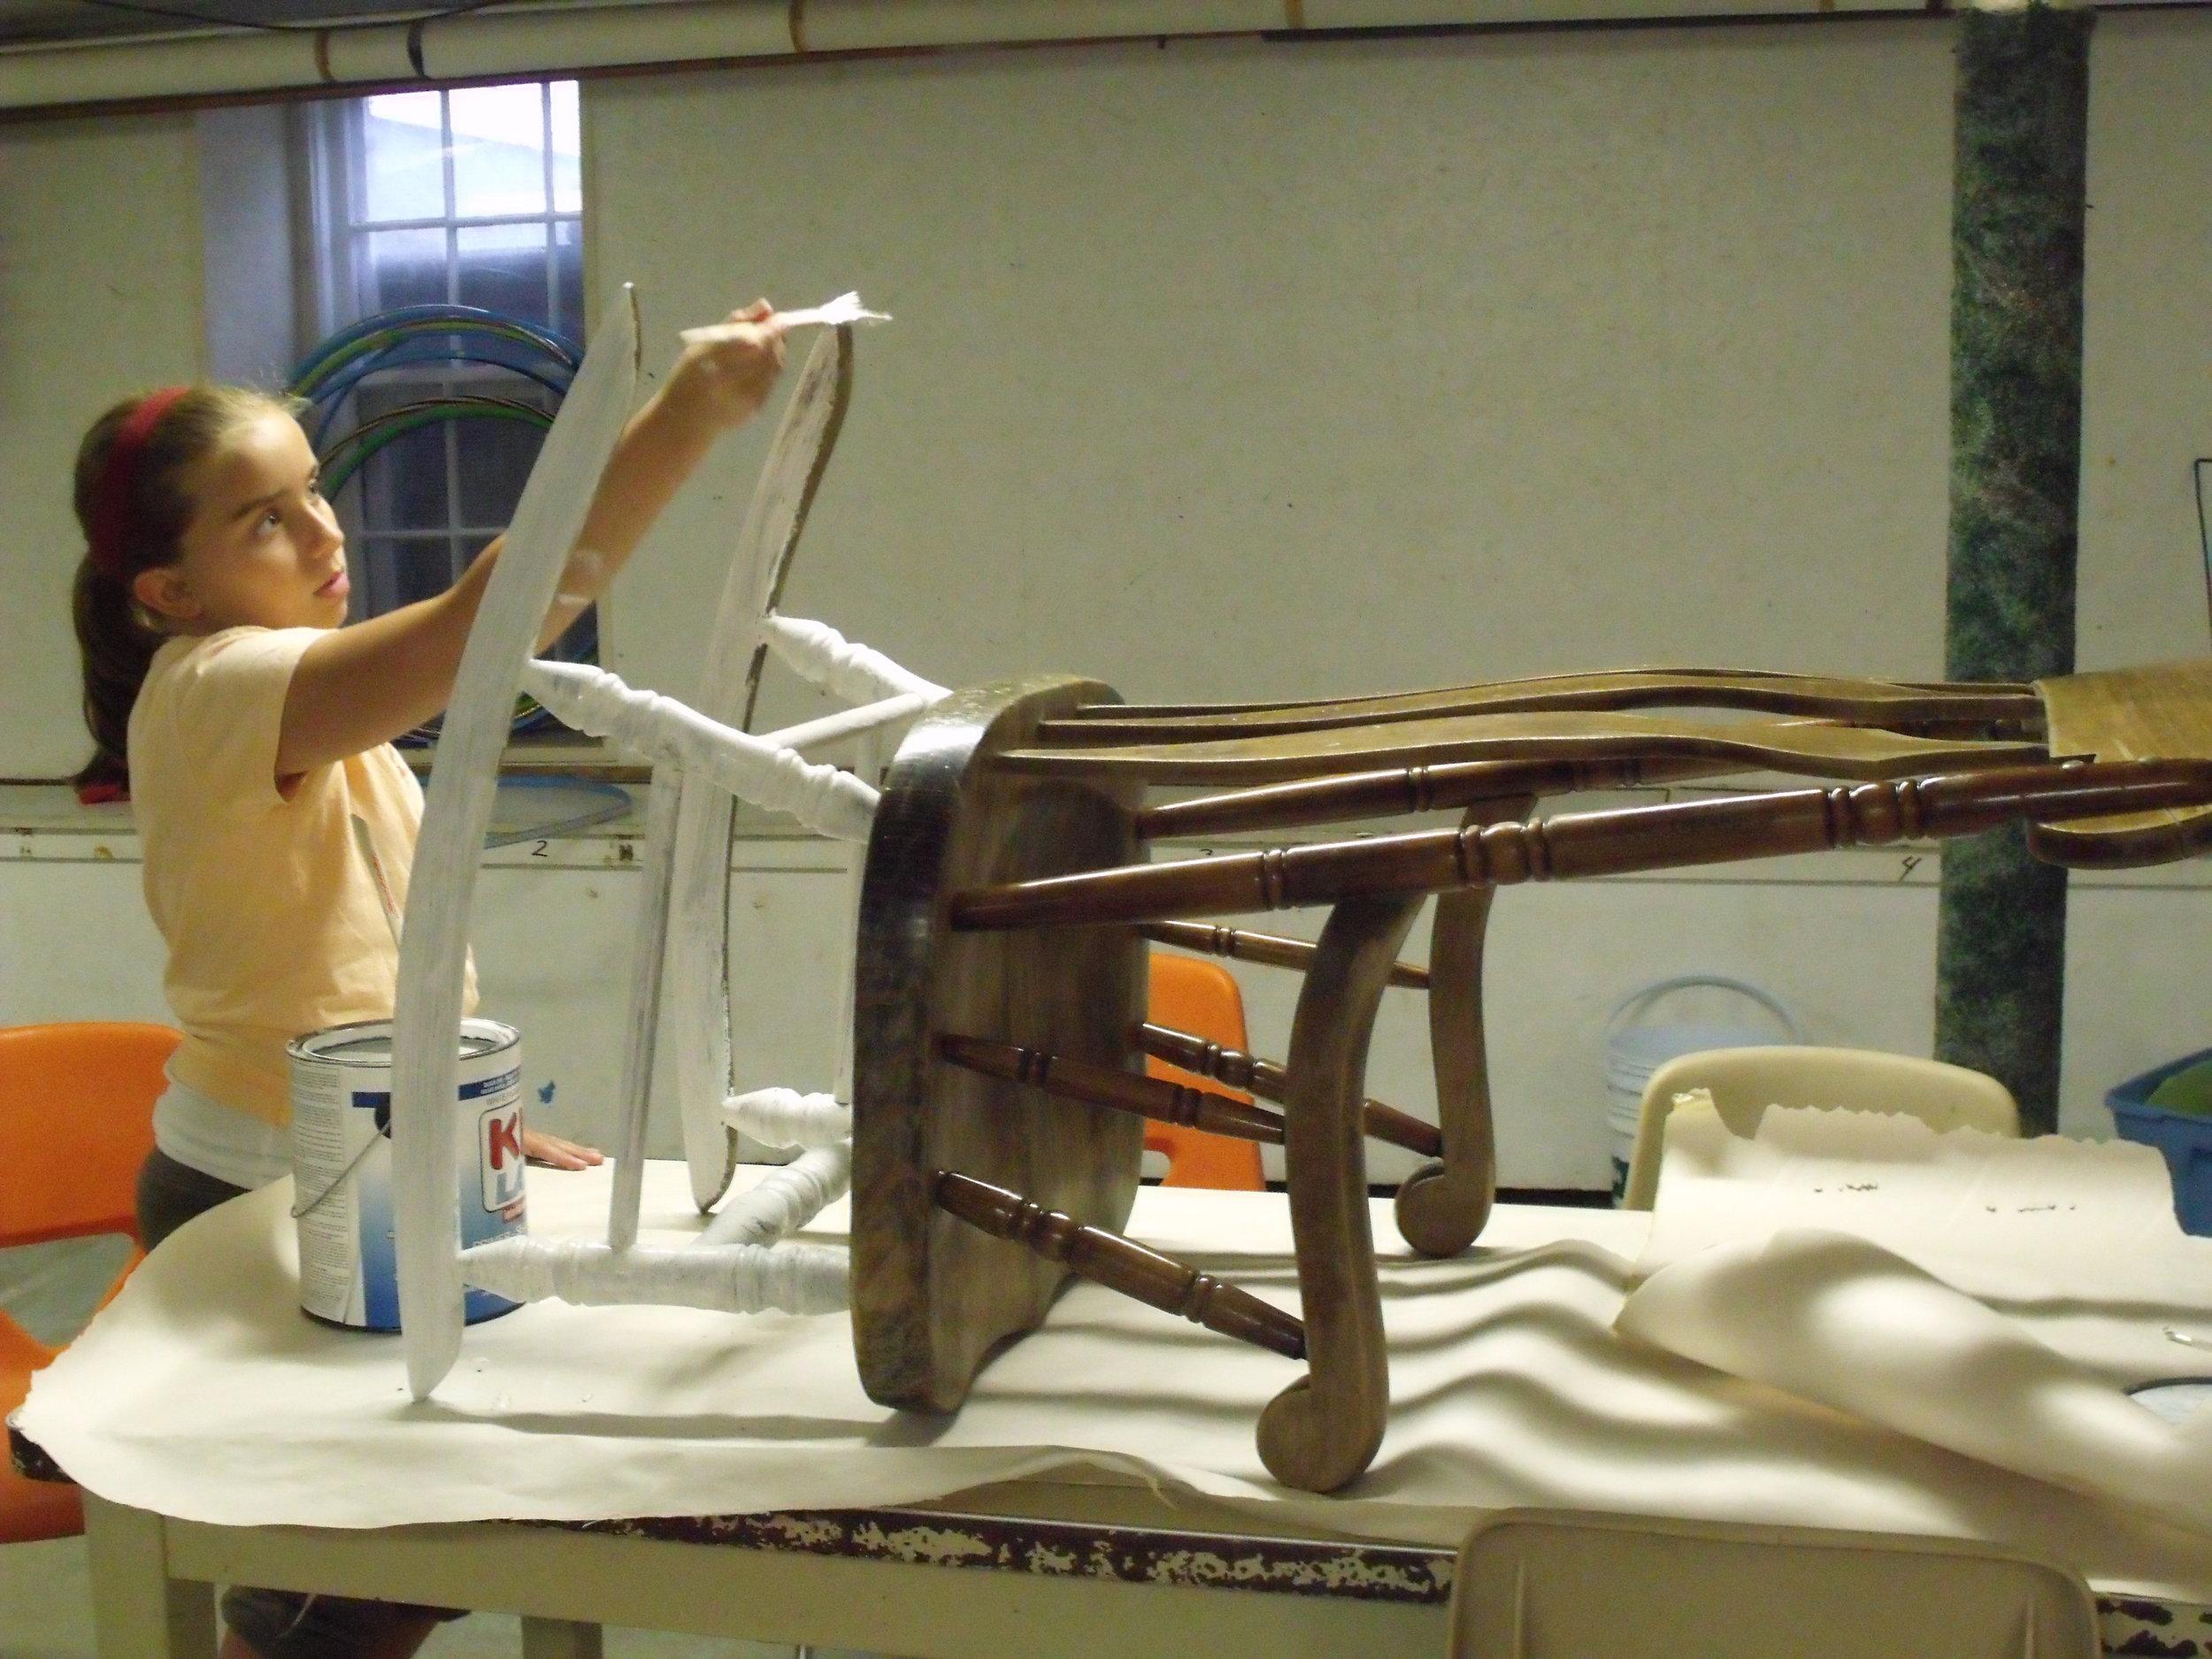 Volunteerism -- Sylvia painting rocking chair Aug 2011 002.jpg